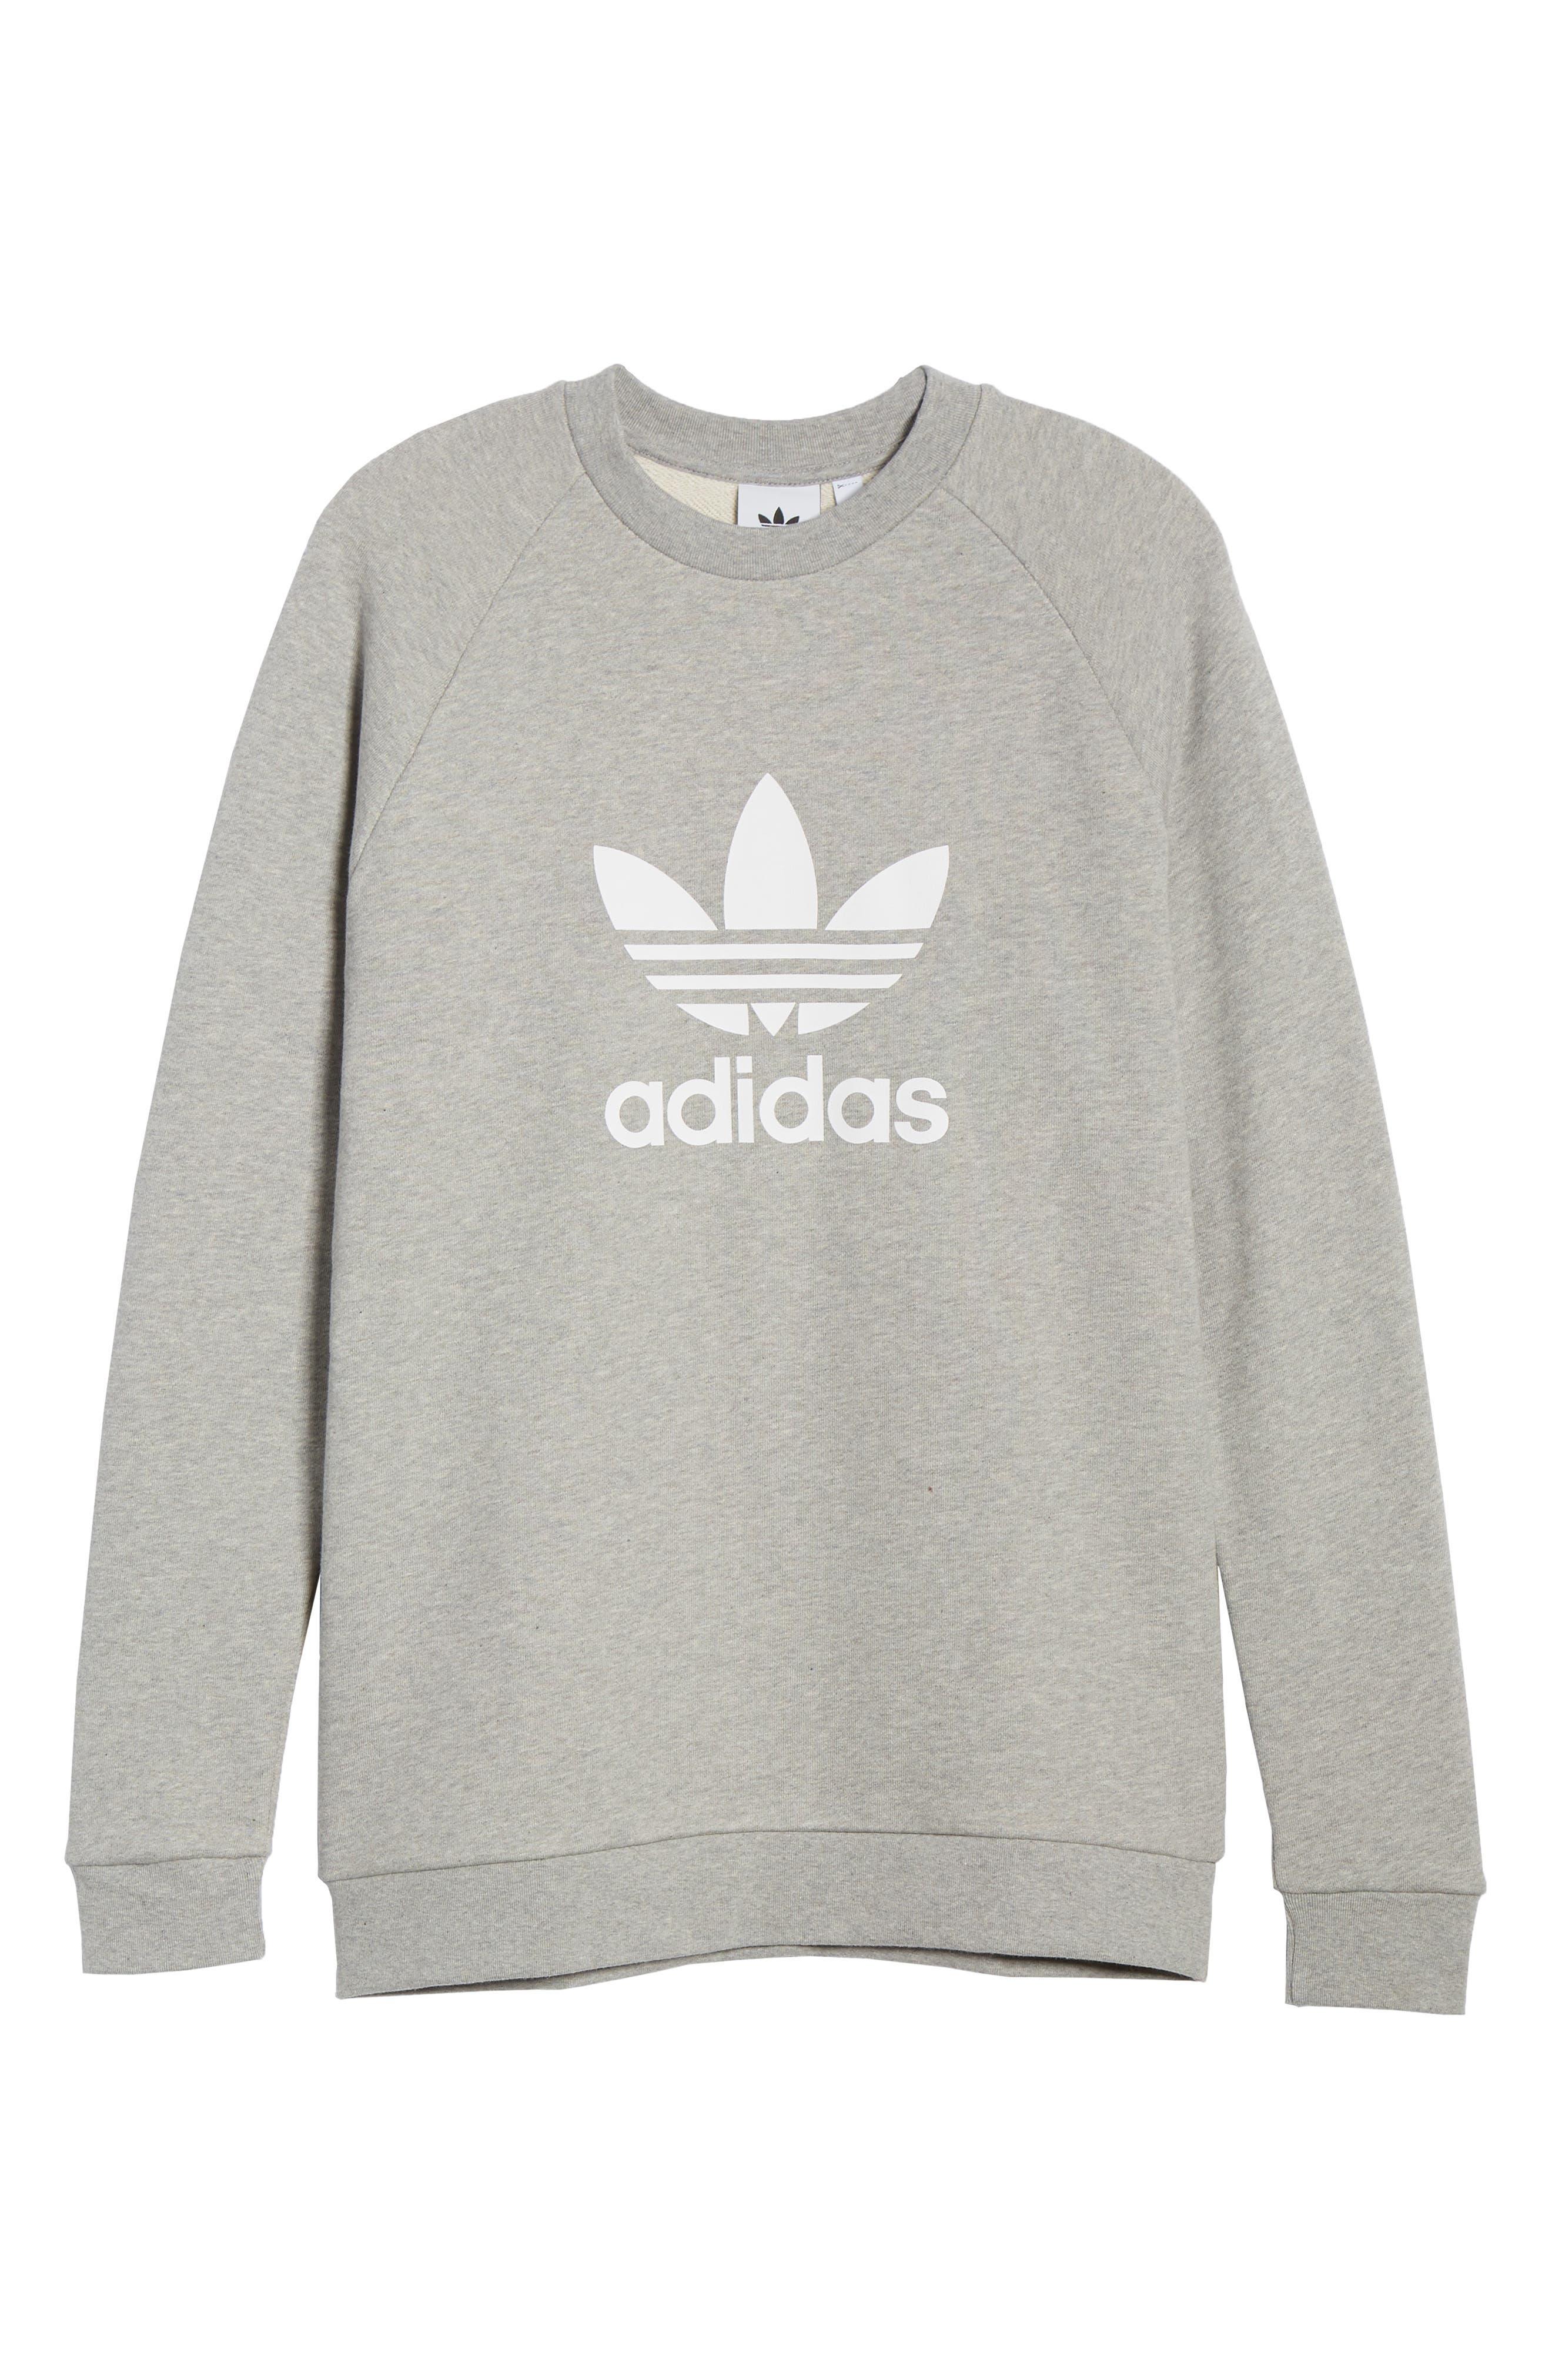 ADIDAS ORIGINALS, adidas Trefoil Crewneck Sweatshirt, Alternate thumbnail 5, color, MEDIUM GREY HEATHER